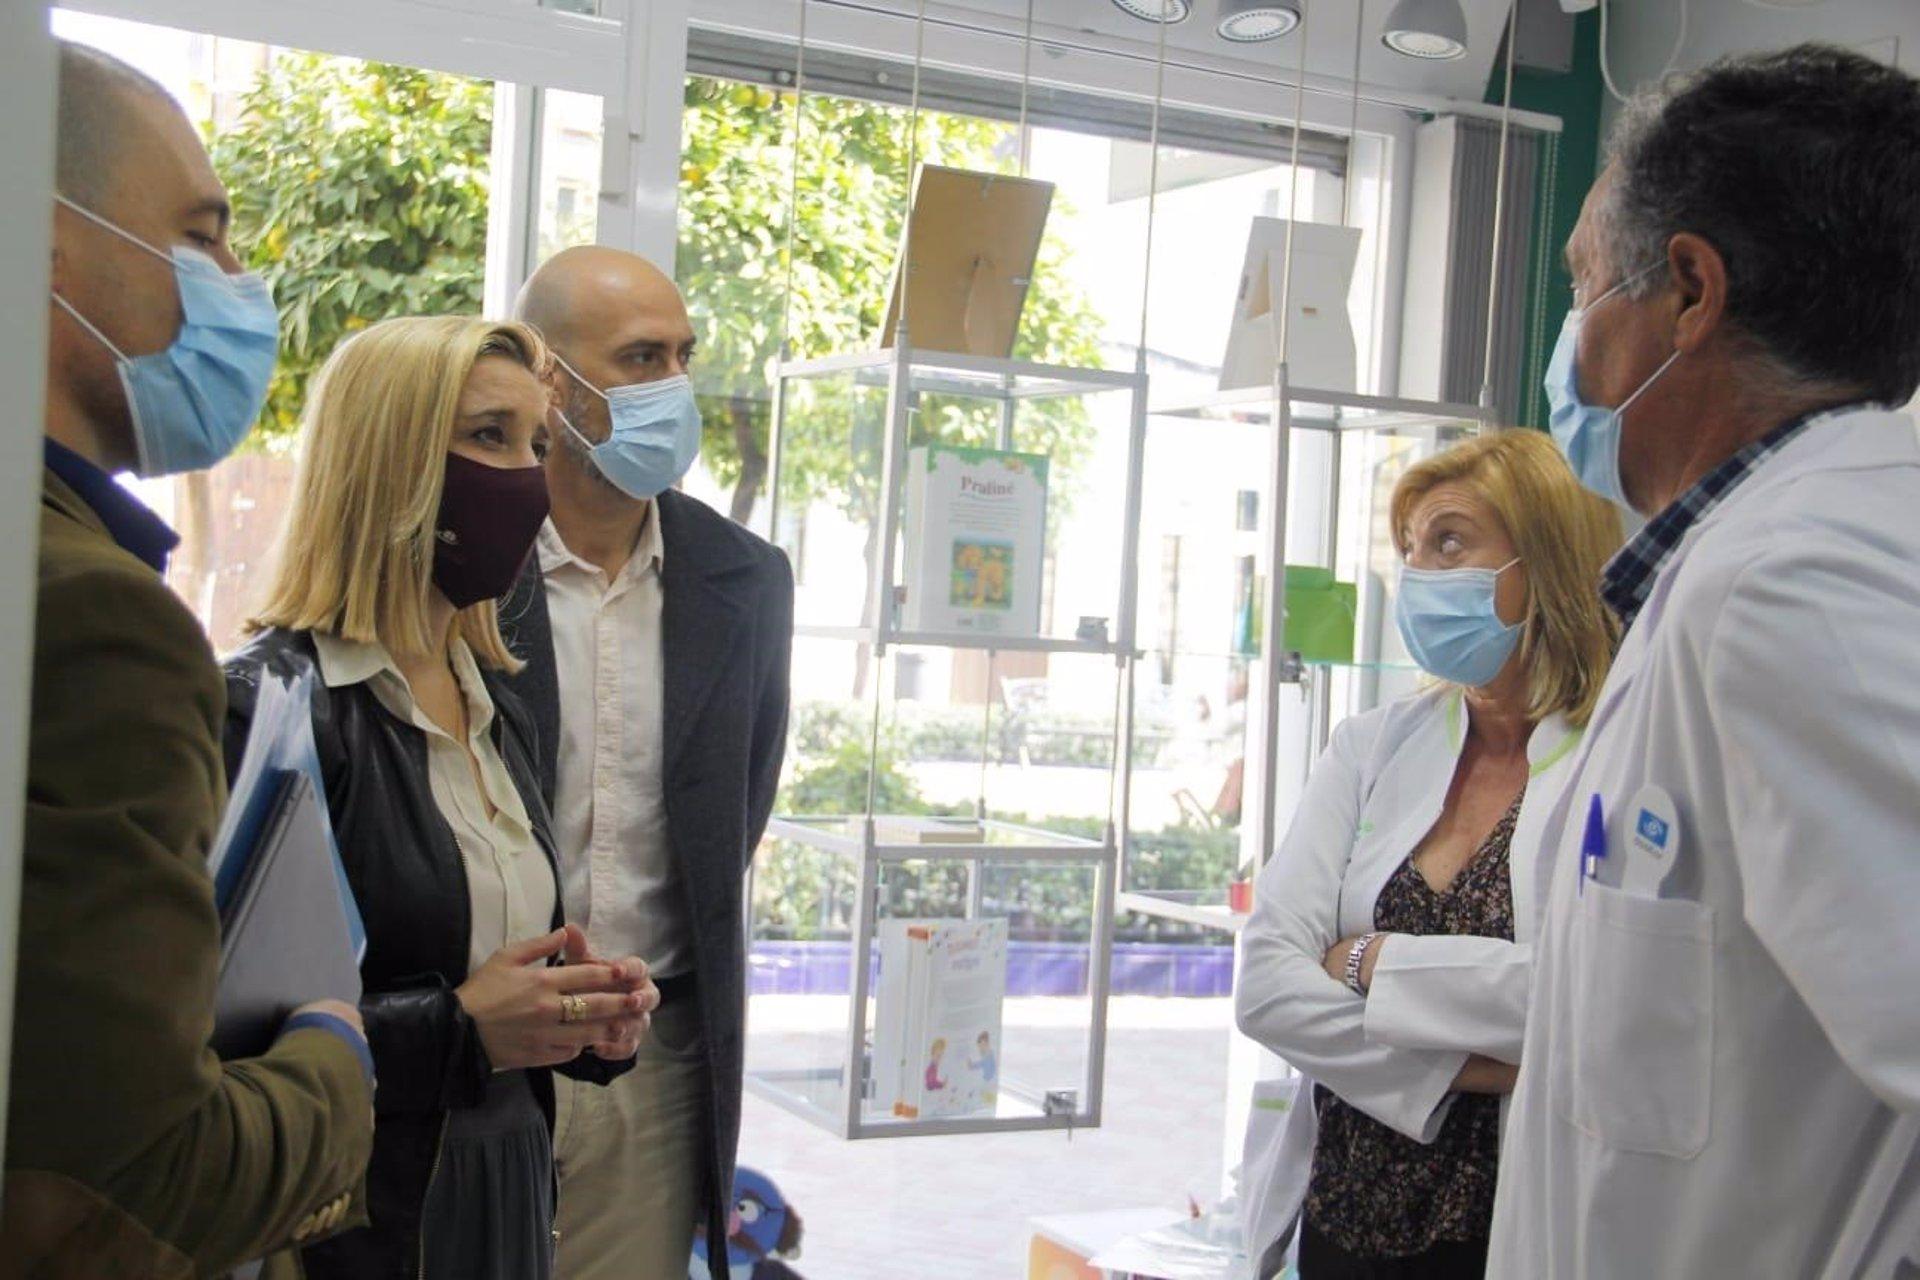 Sevilla.-Cvirus.- Concedida nuevas ayudas de 1.000 euros para microempresas de Alcalá Guadaíra afectadas por la crisis